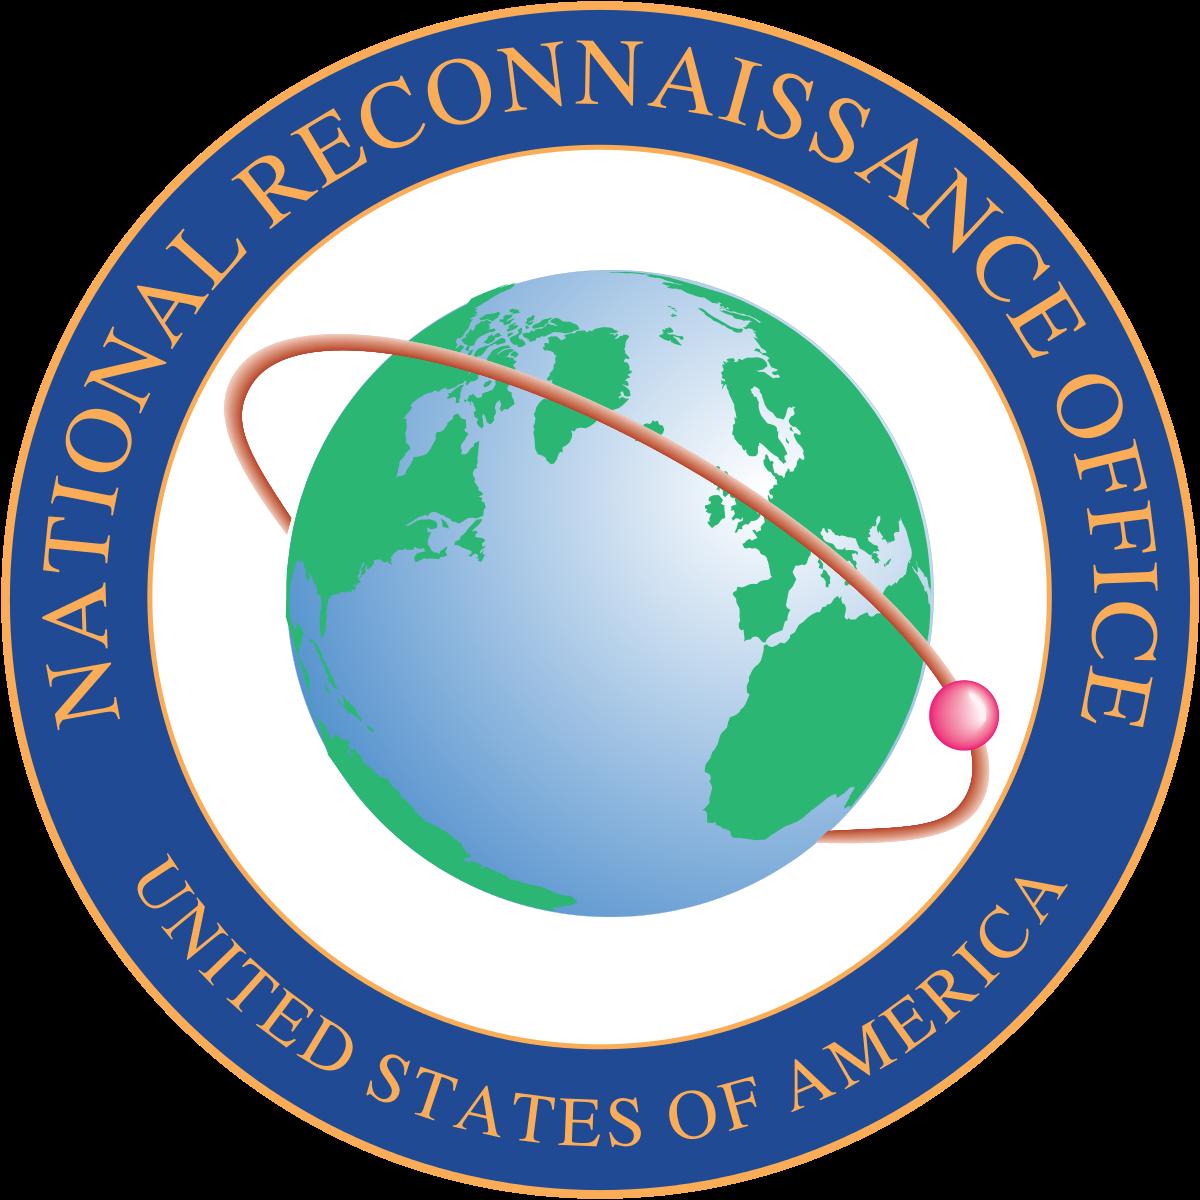 National Reconnaissance Office.